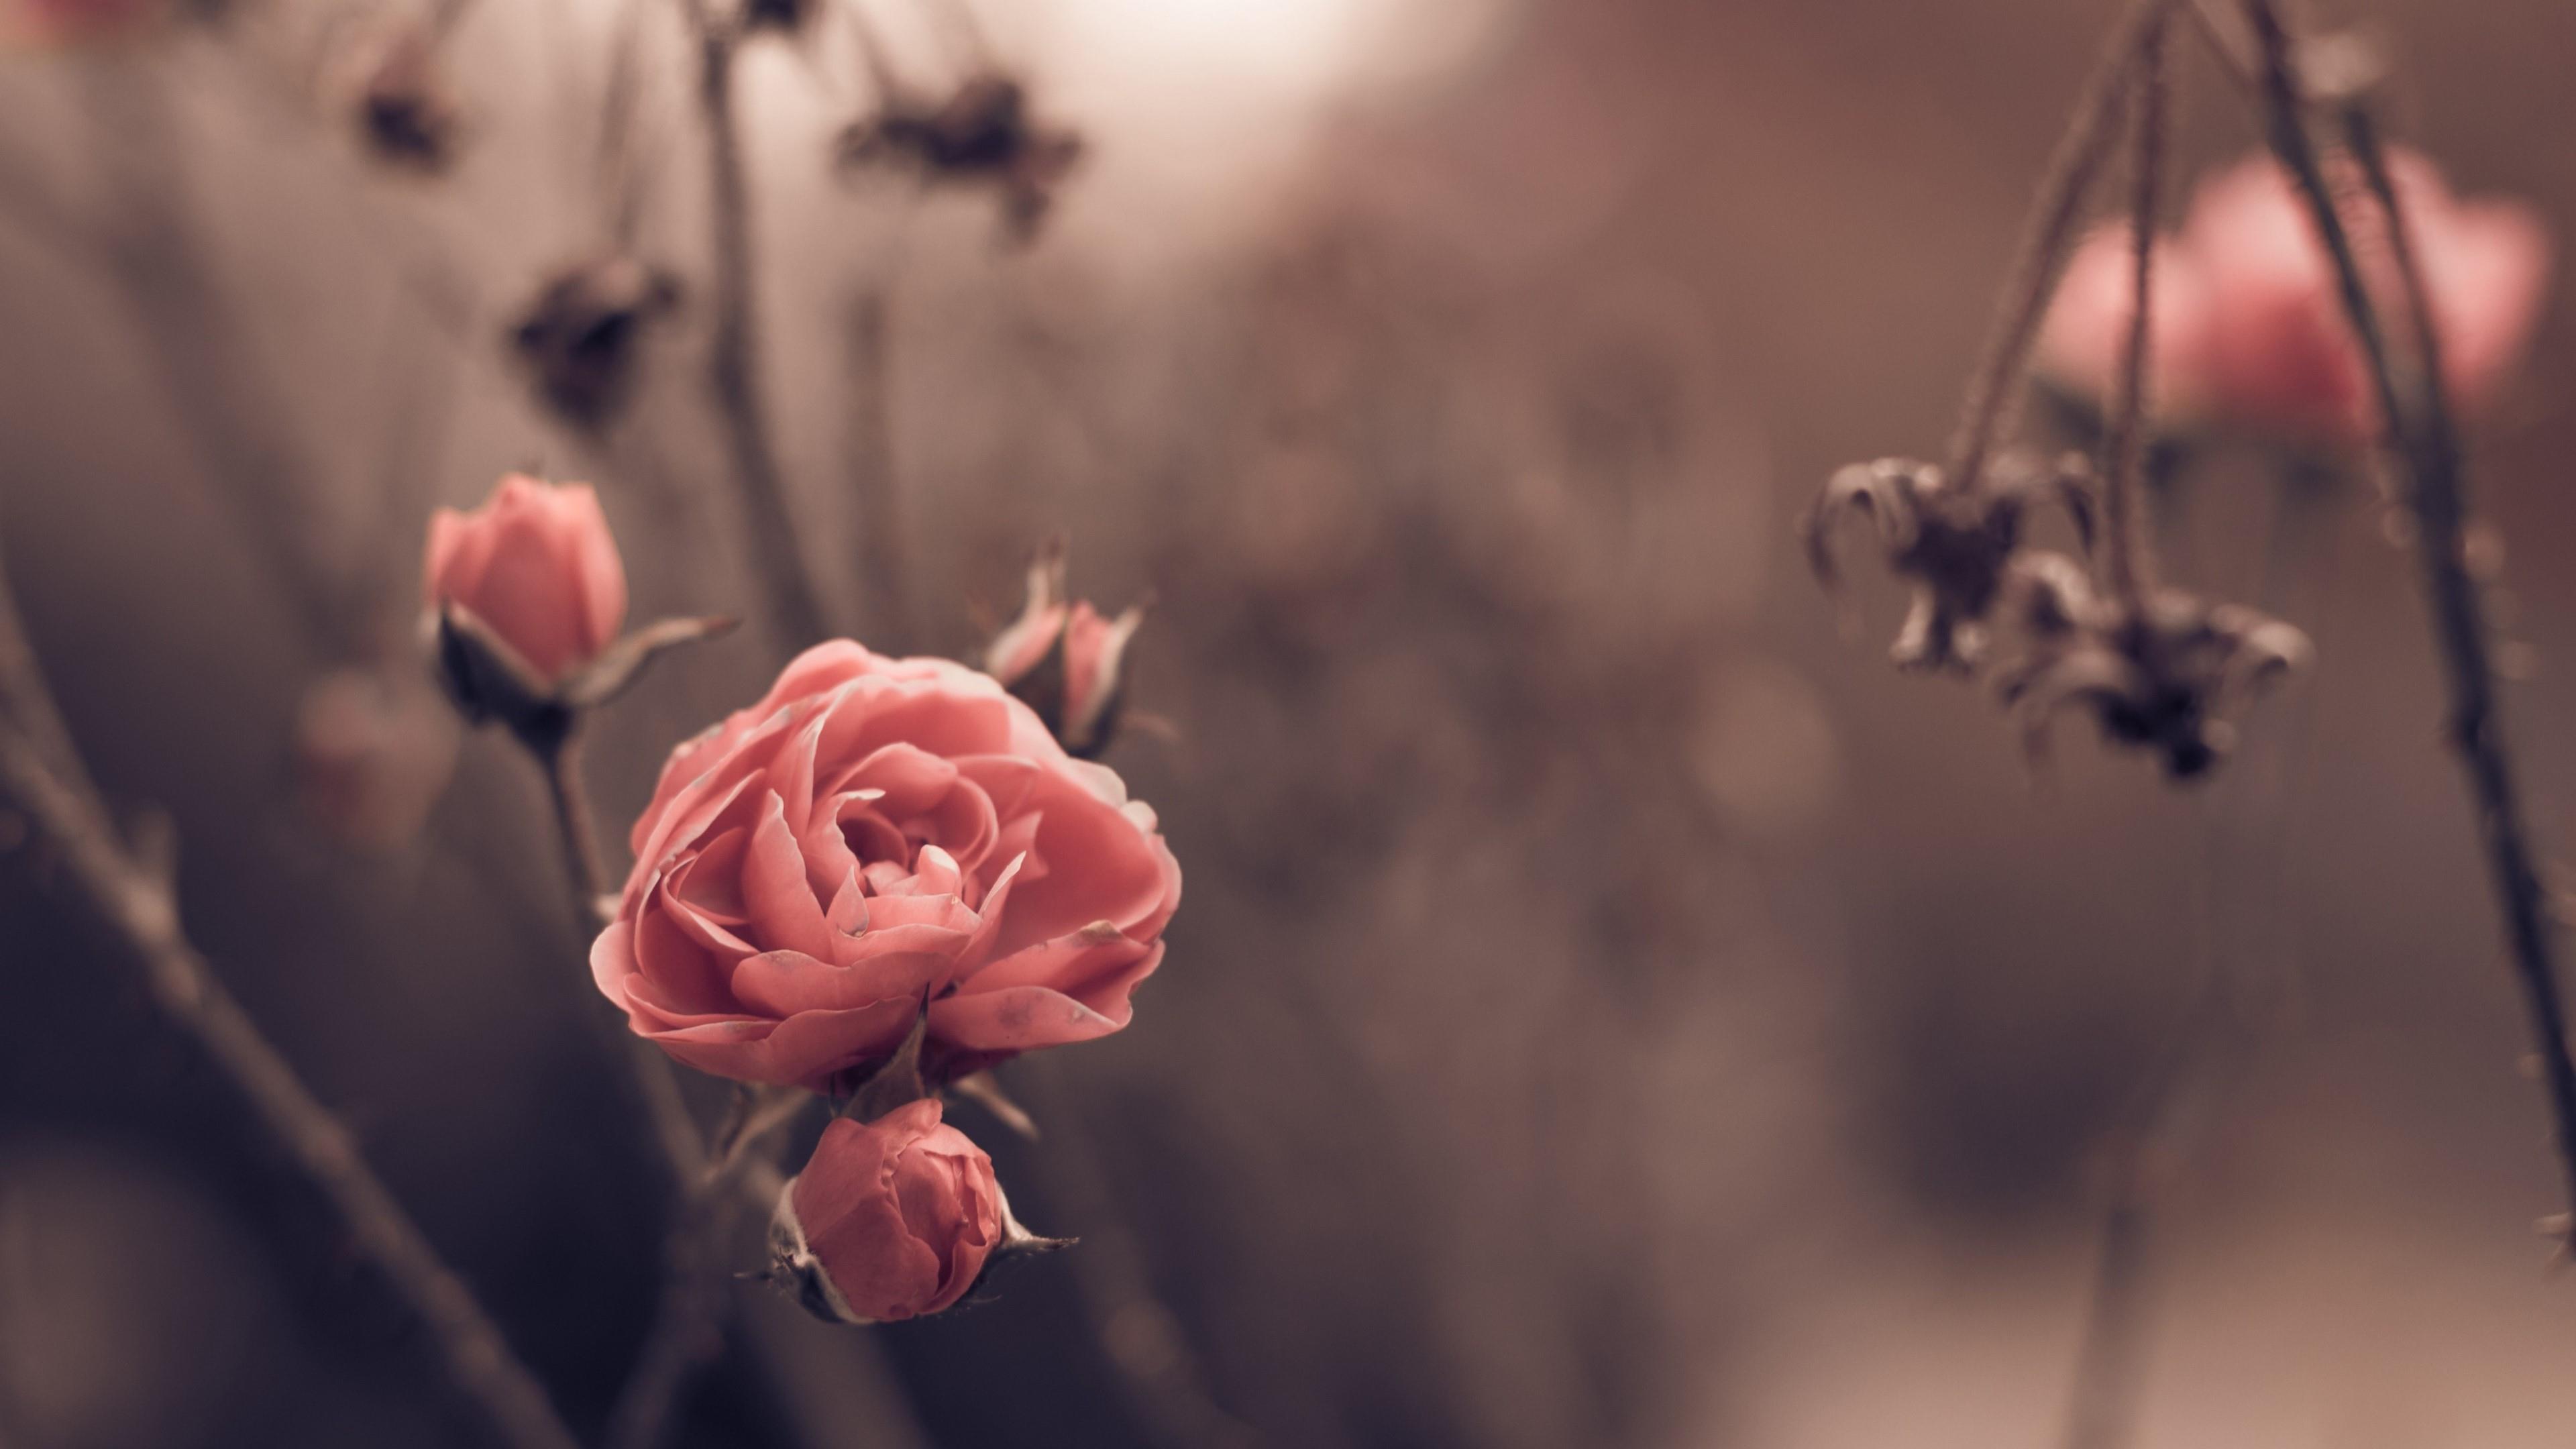 Pink roses in the autumn garden wallpaper